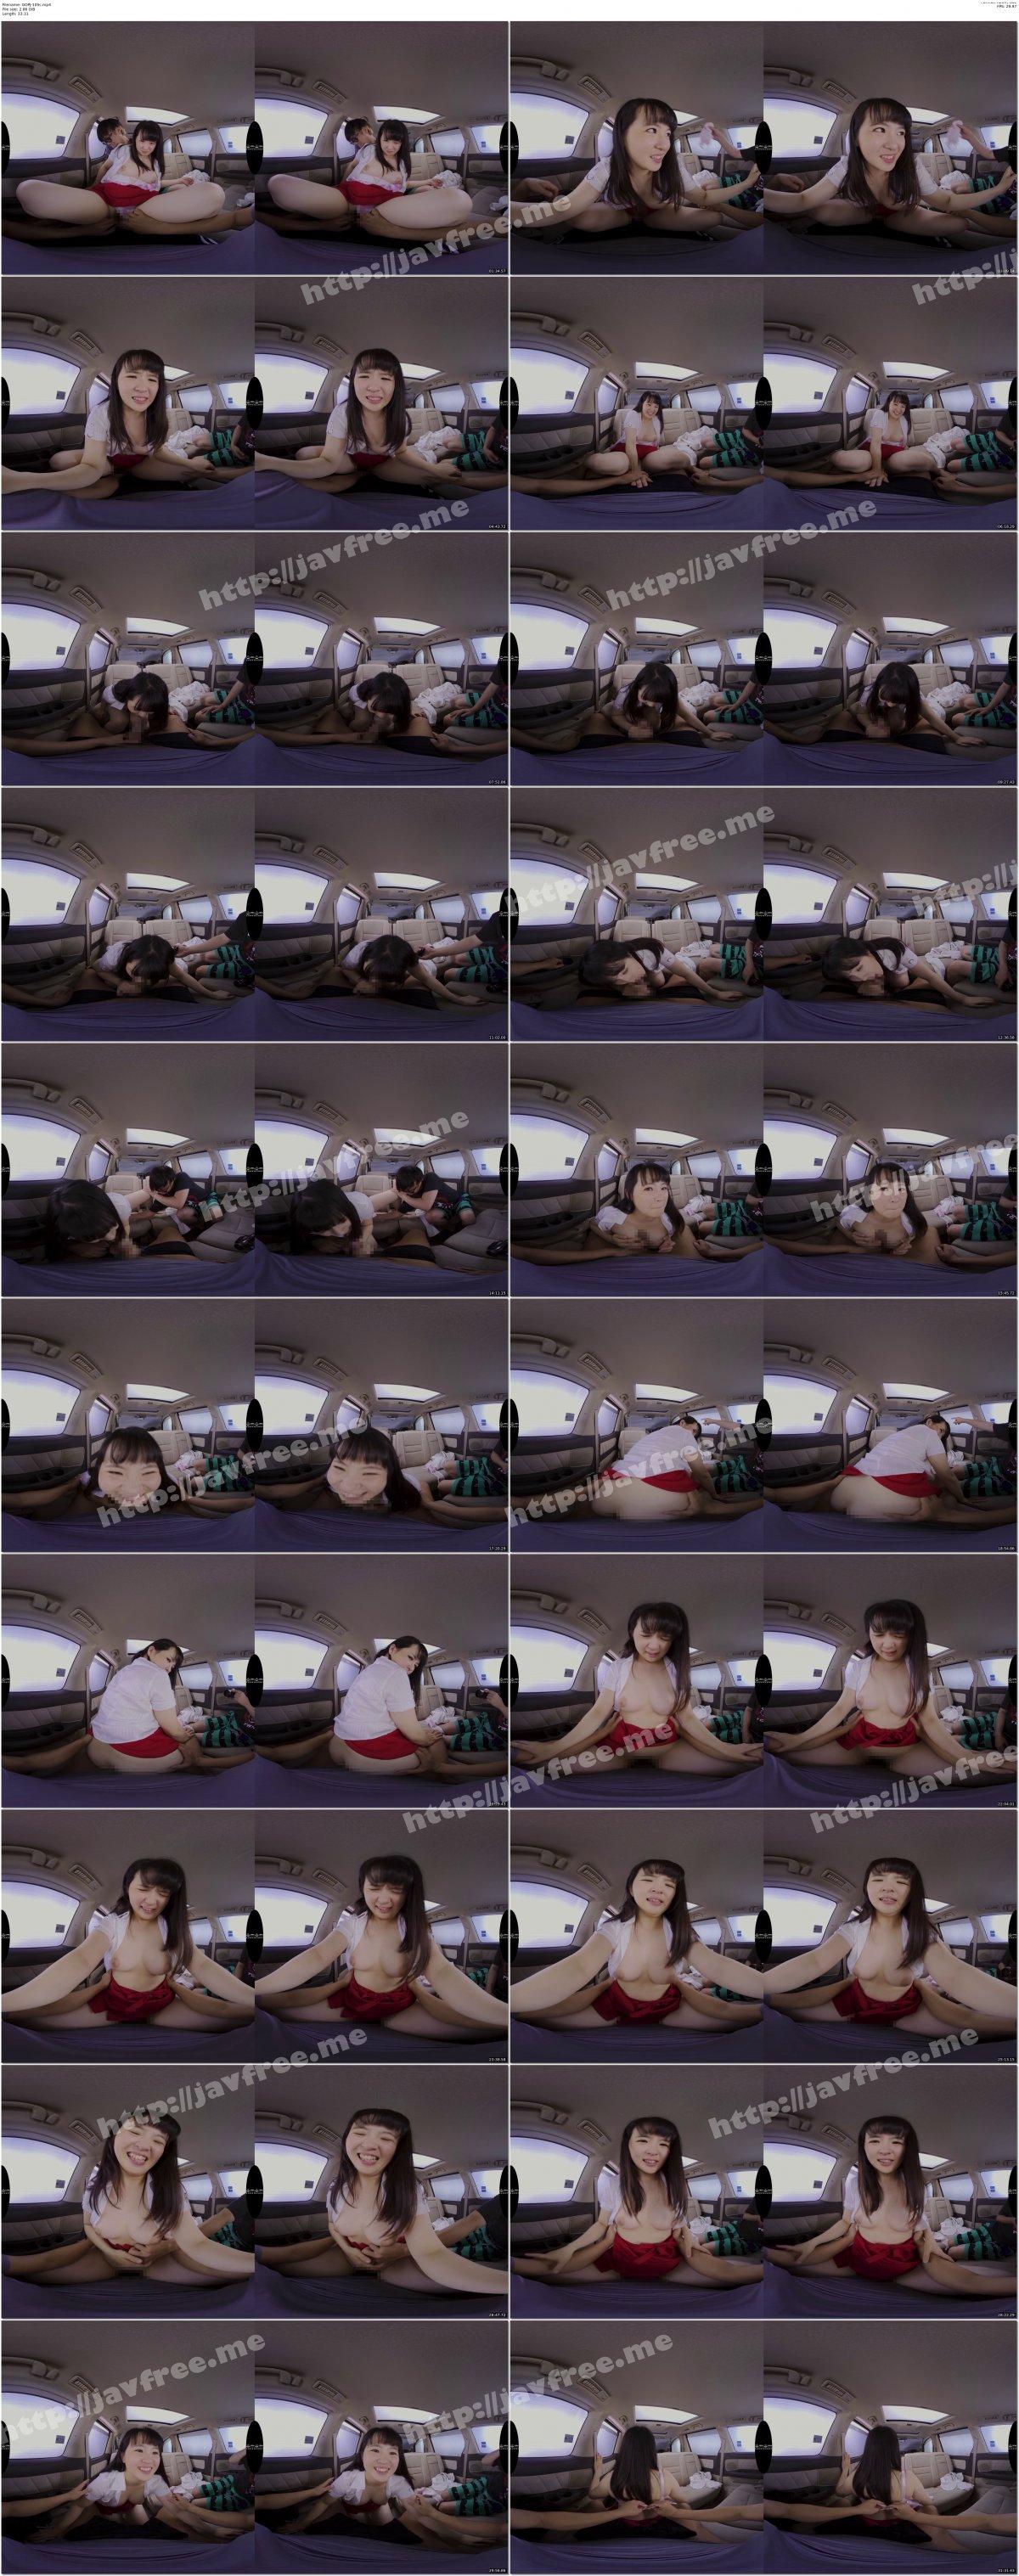 [GOPJ-105] 【VR】劇的高画質 松田真奈 生中出し ナンパして車内でヤッちゃえ!激カワ巨乳娘GET 3 - image GOPJ-105c on https://javfree.me